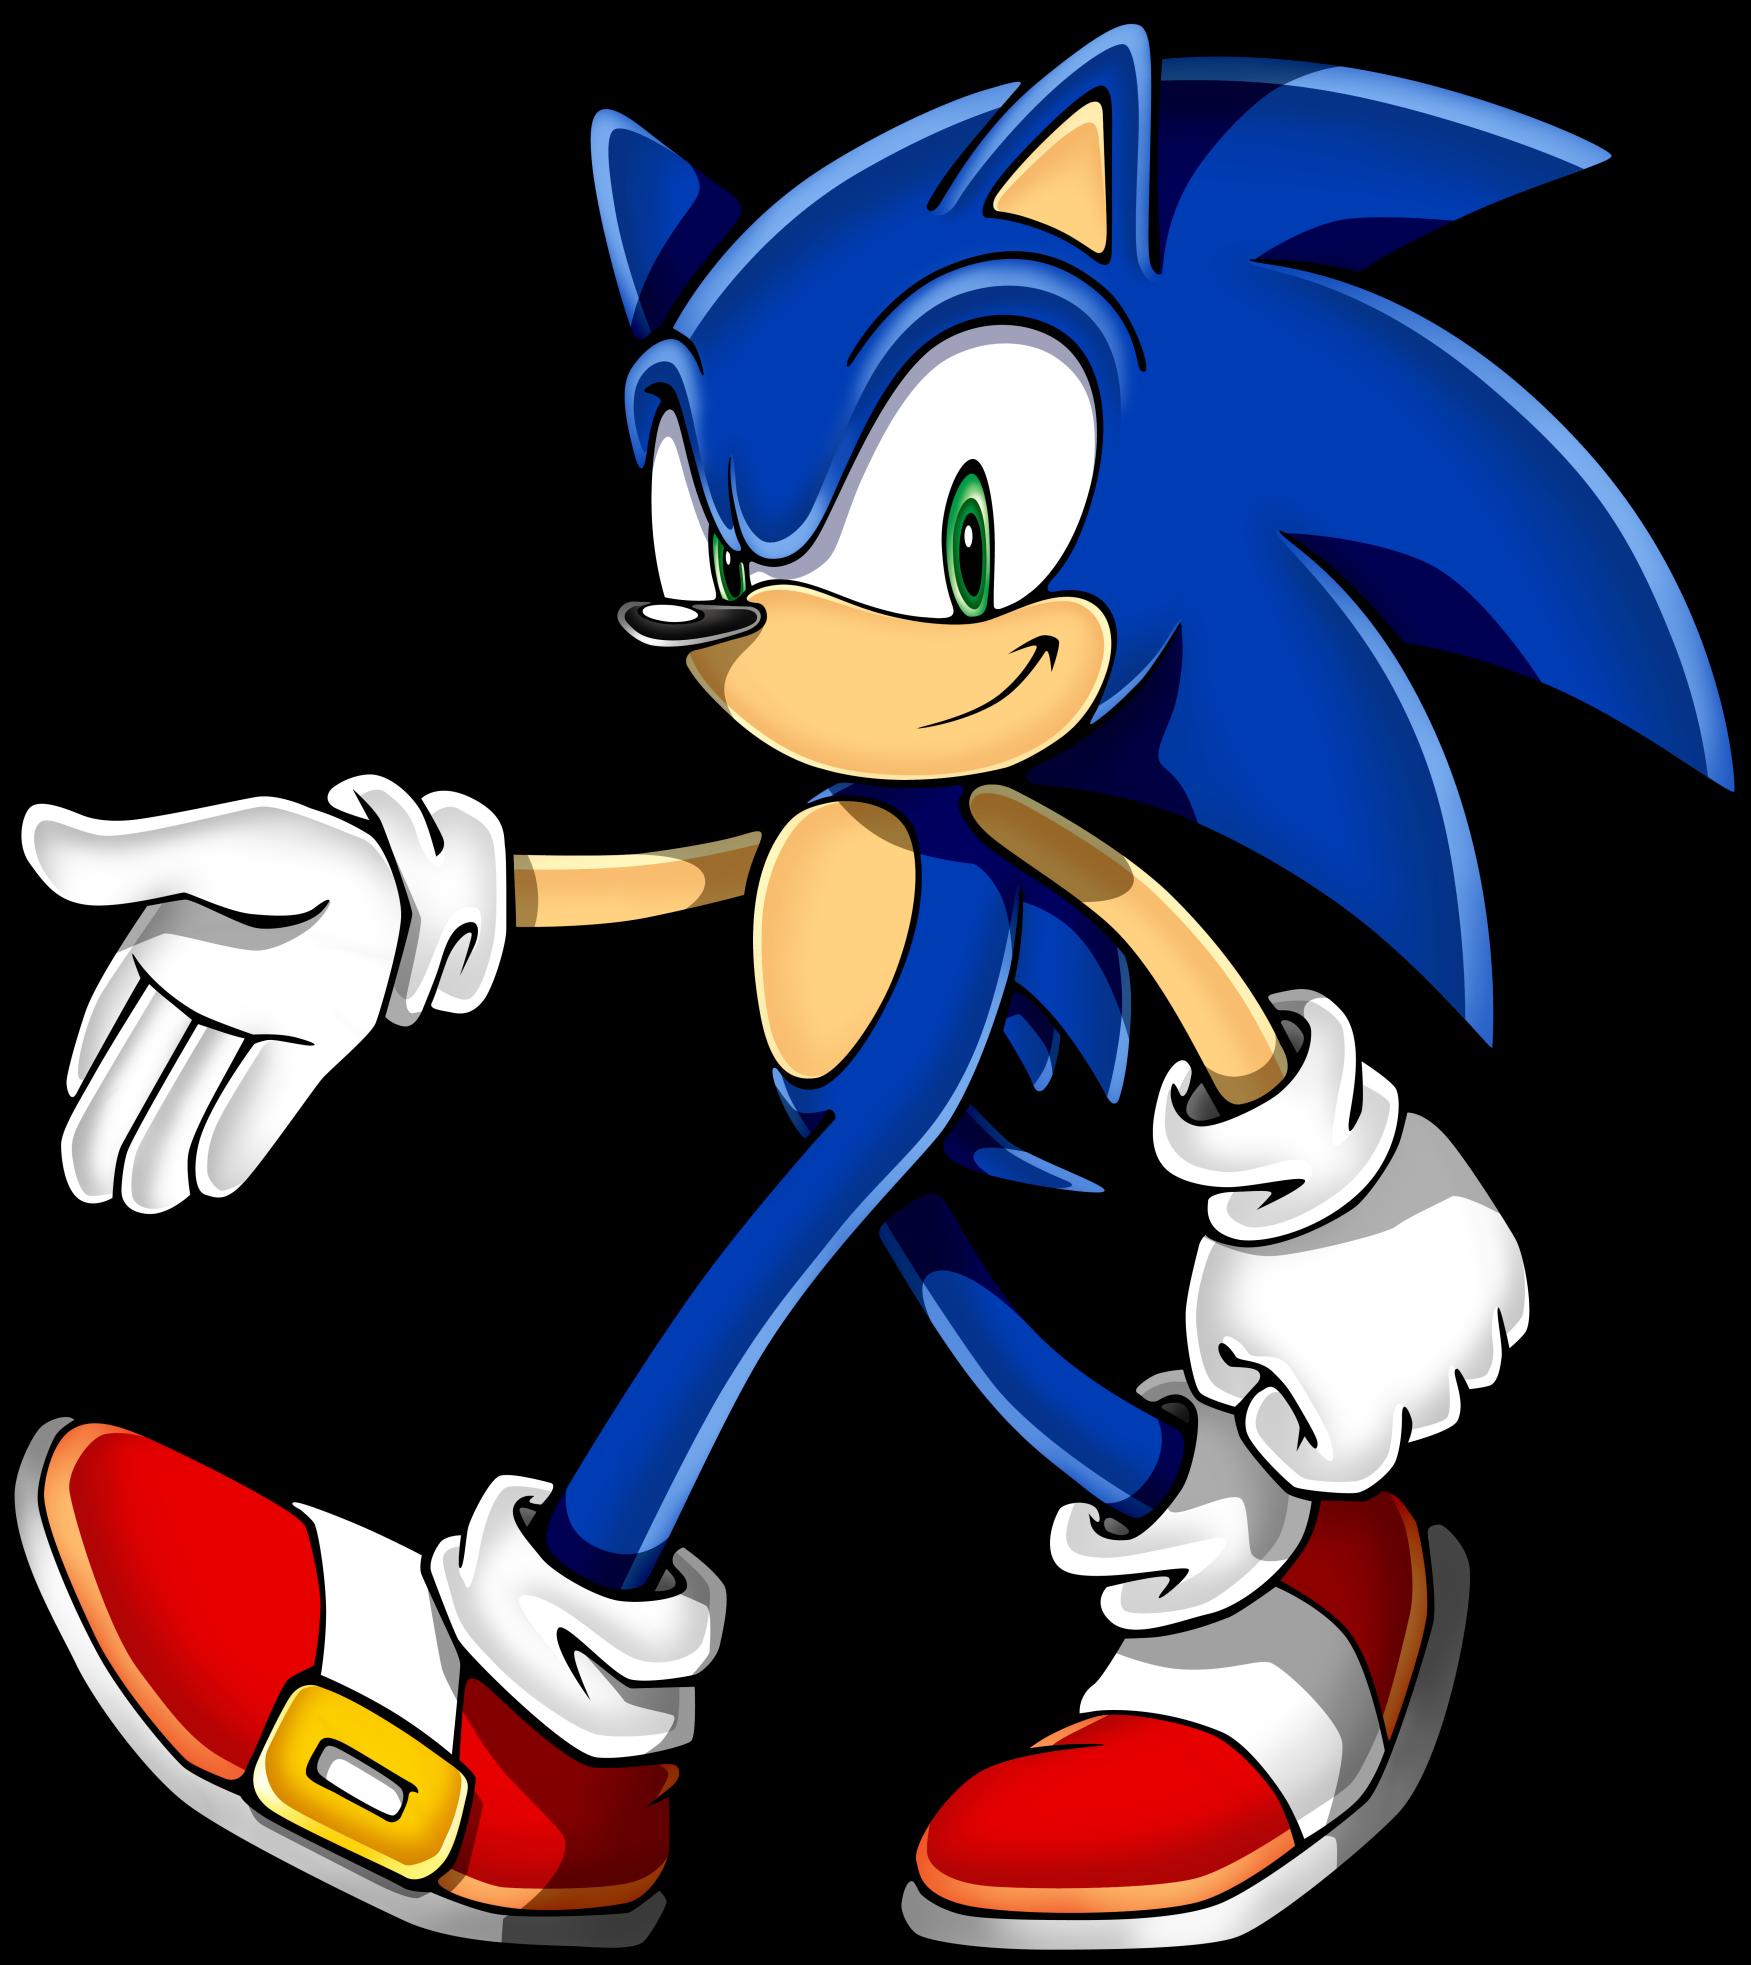 Hedgehog clipart vector. Sonic characters n free